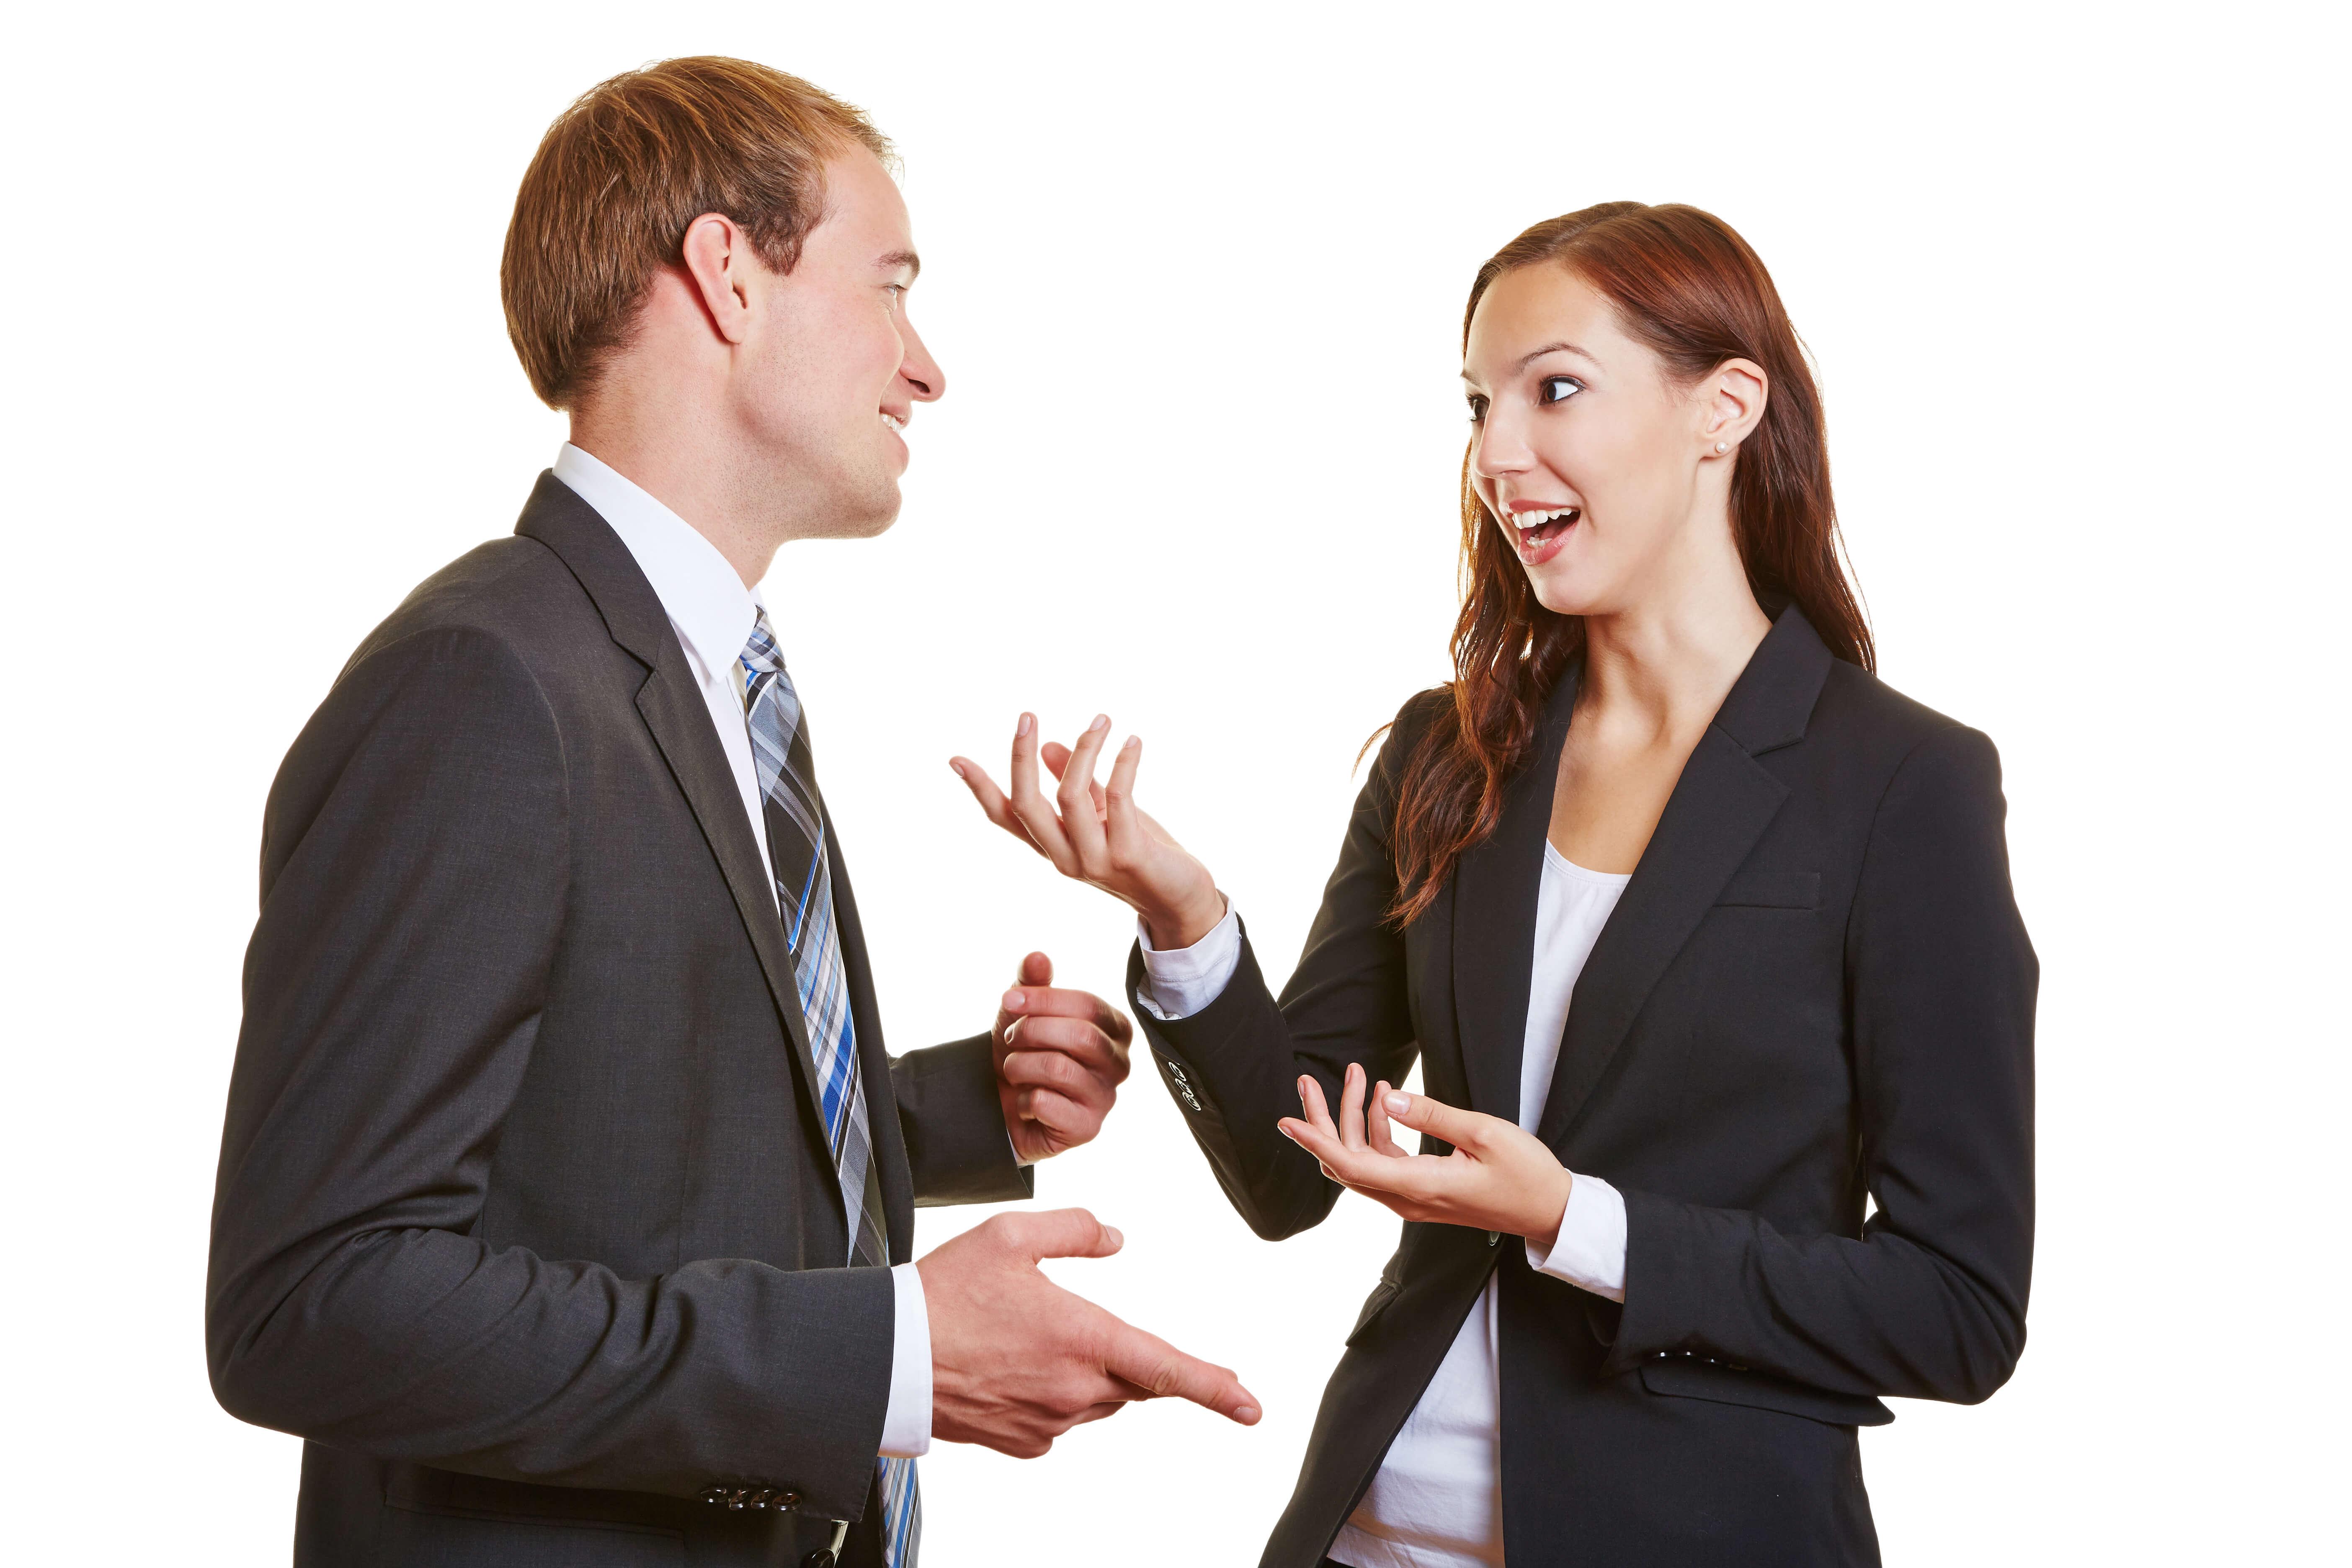 conversation between two friends future career